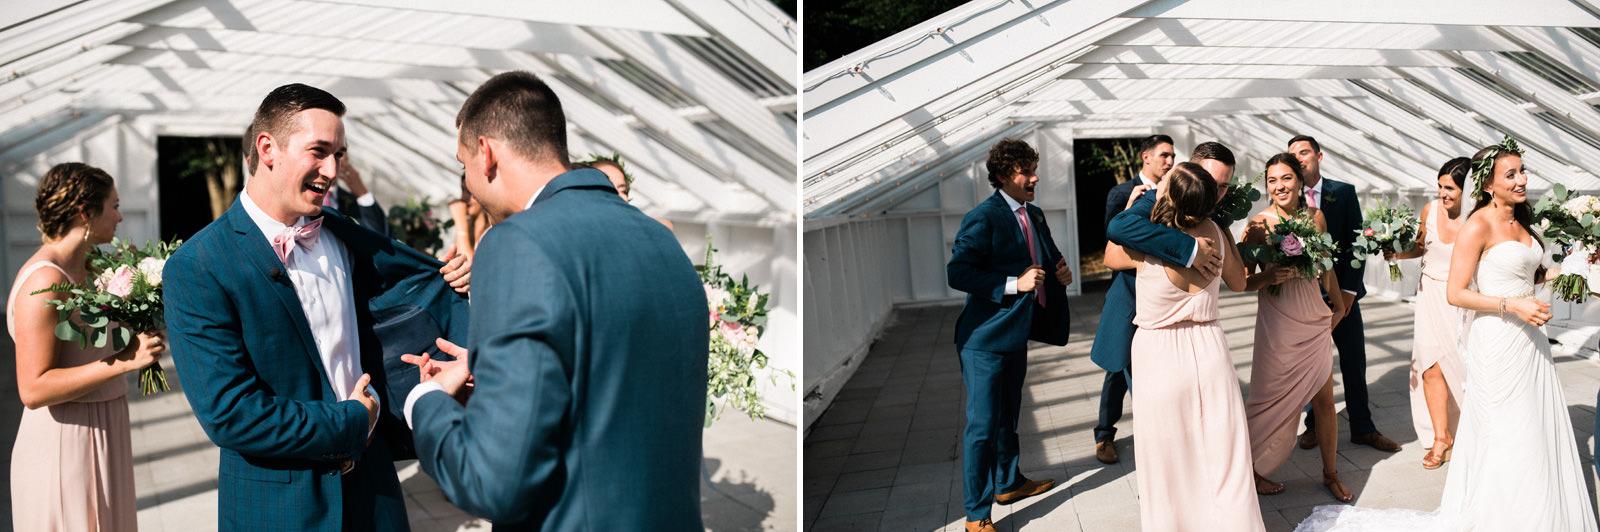 049-woodinville-lavendar-farm-wedding-with-golden-glowy-photos.jpg